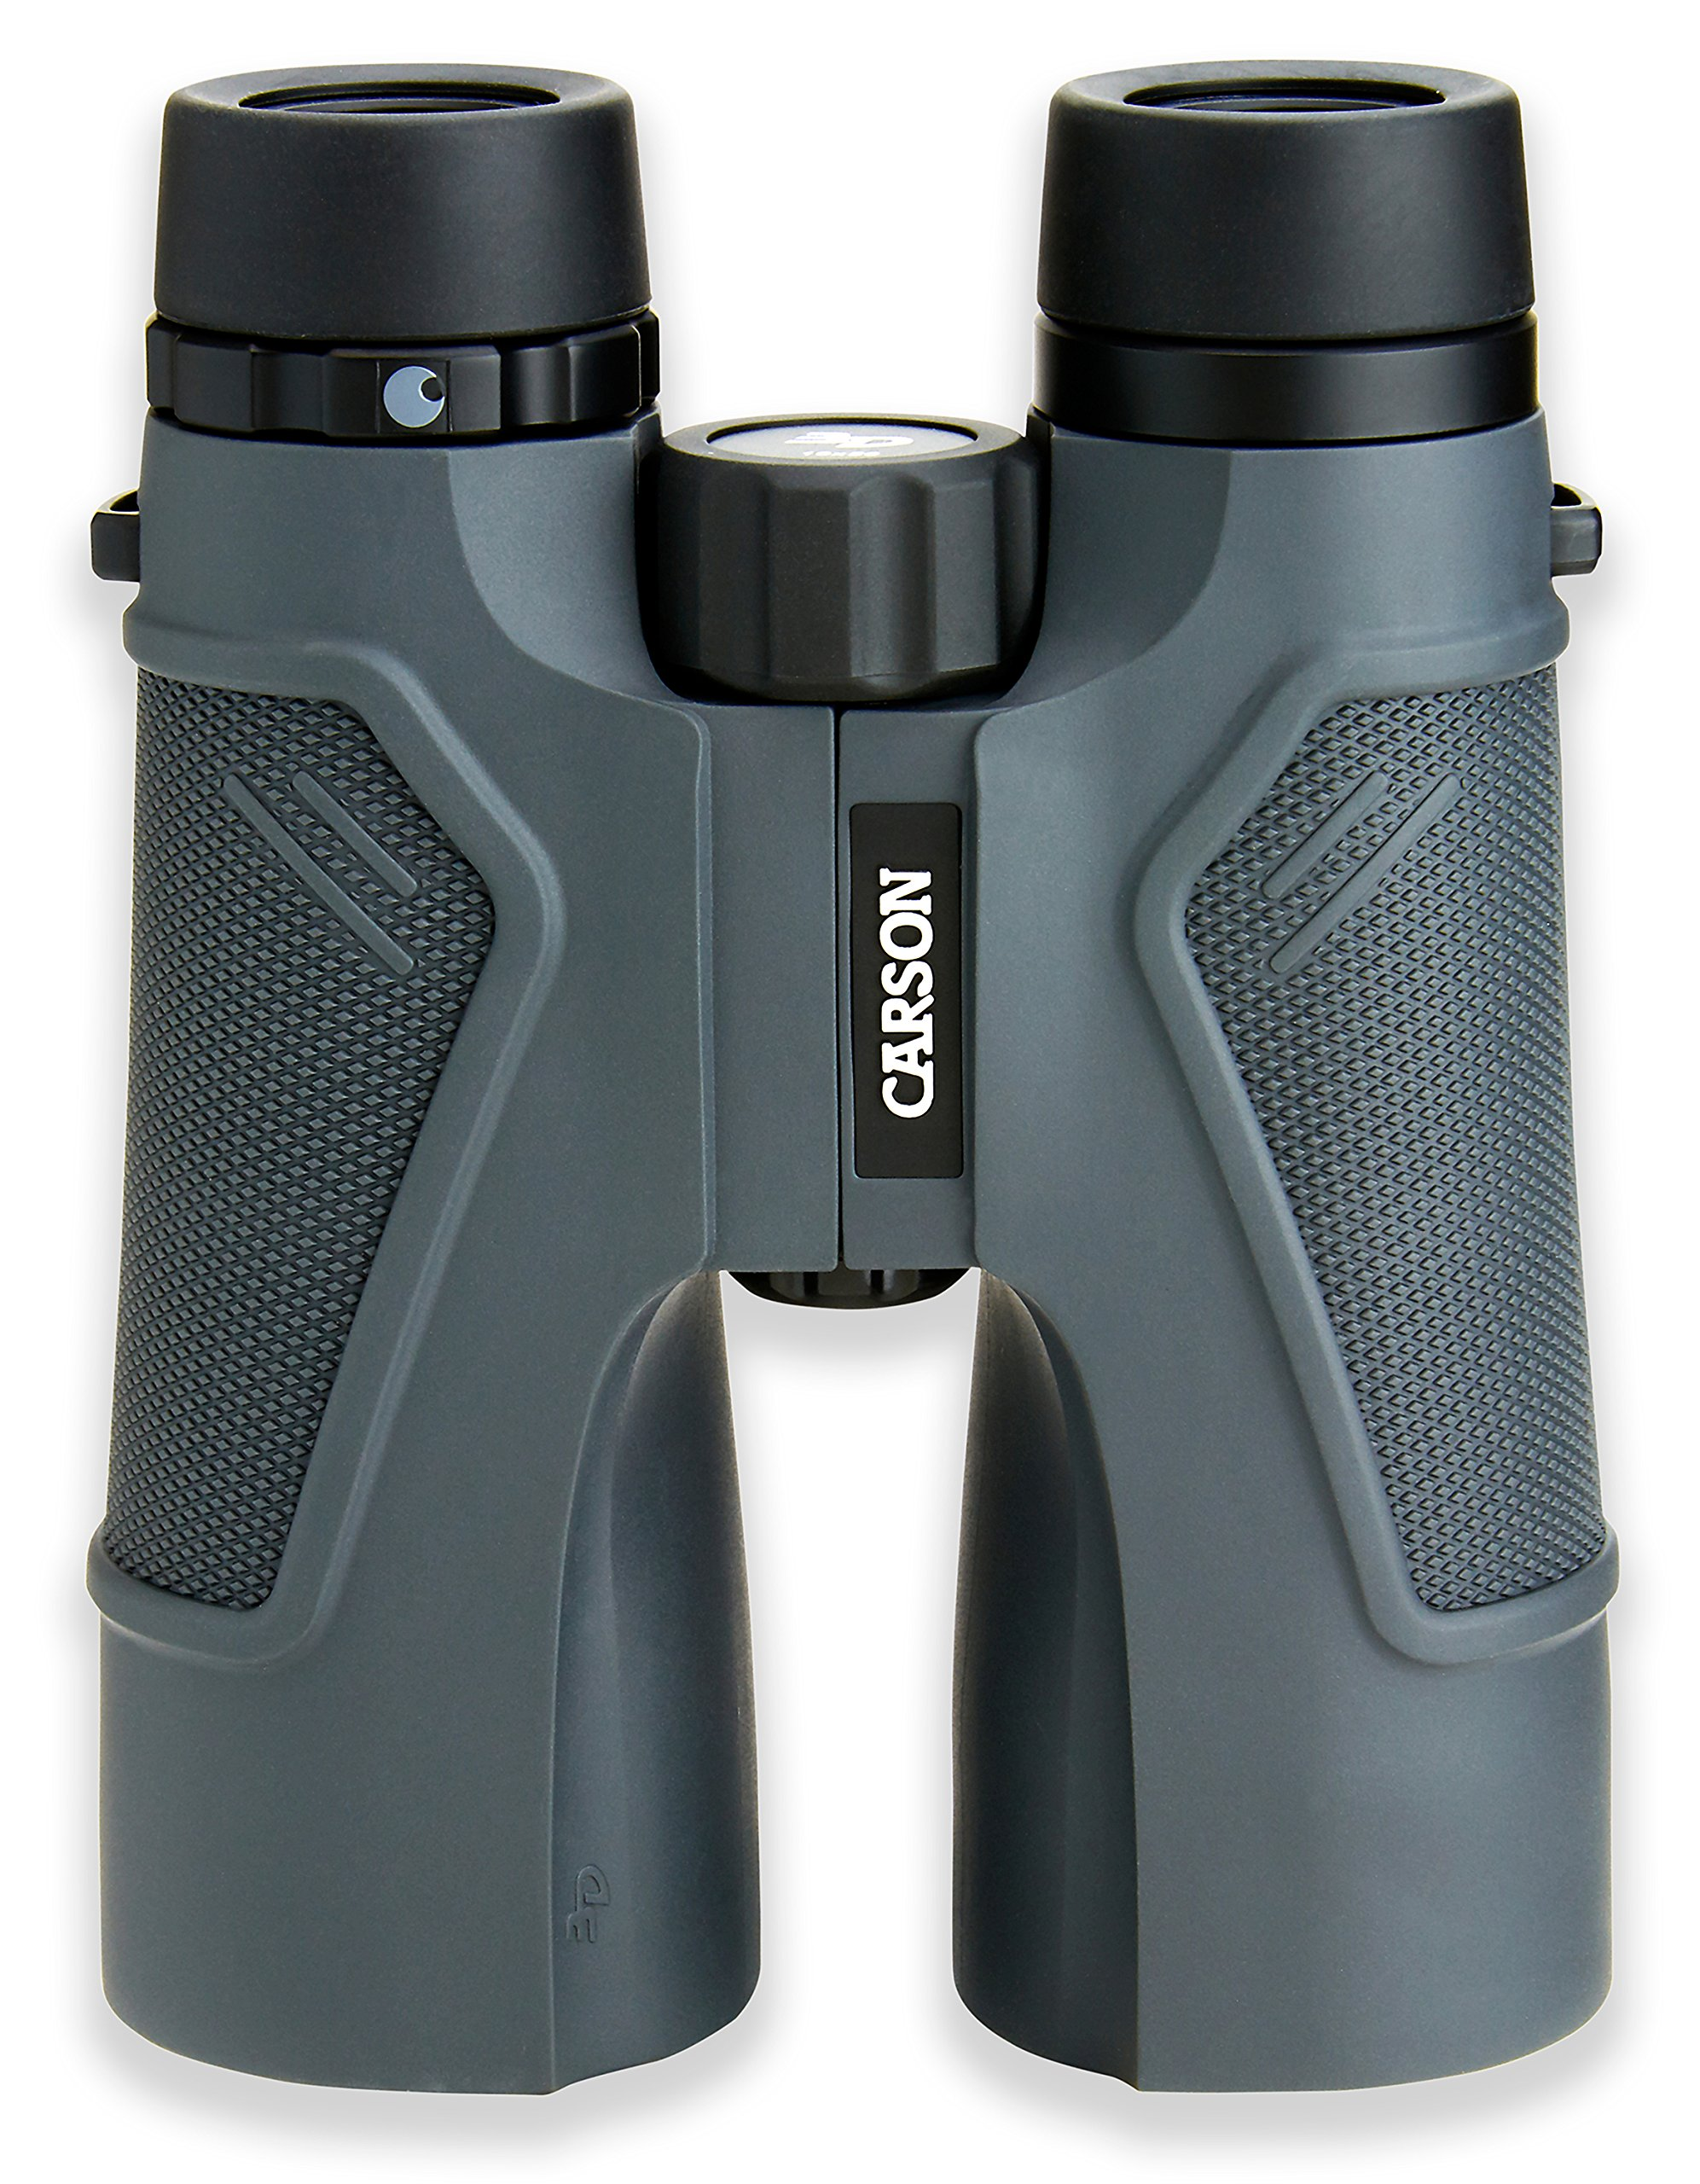 Carson® 3D Series 10x50mm Binocular with High Definition Optics (TD-050) by Carson